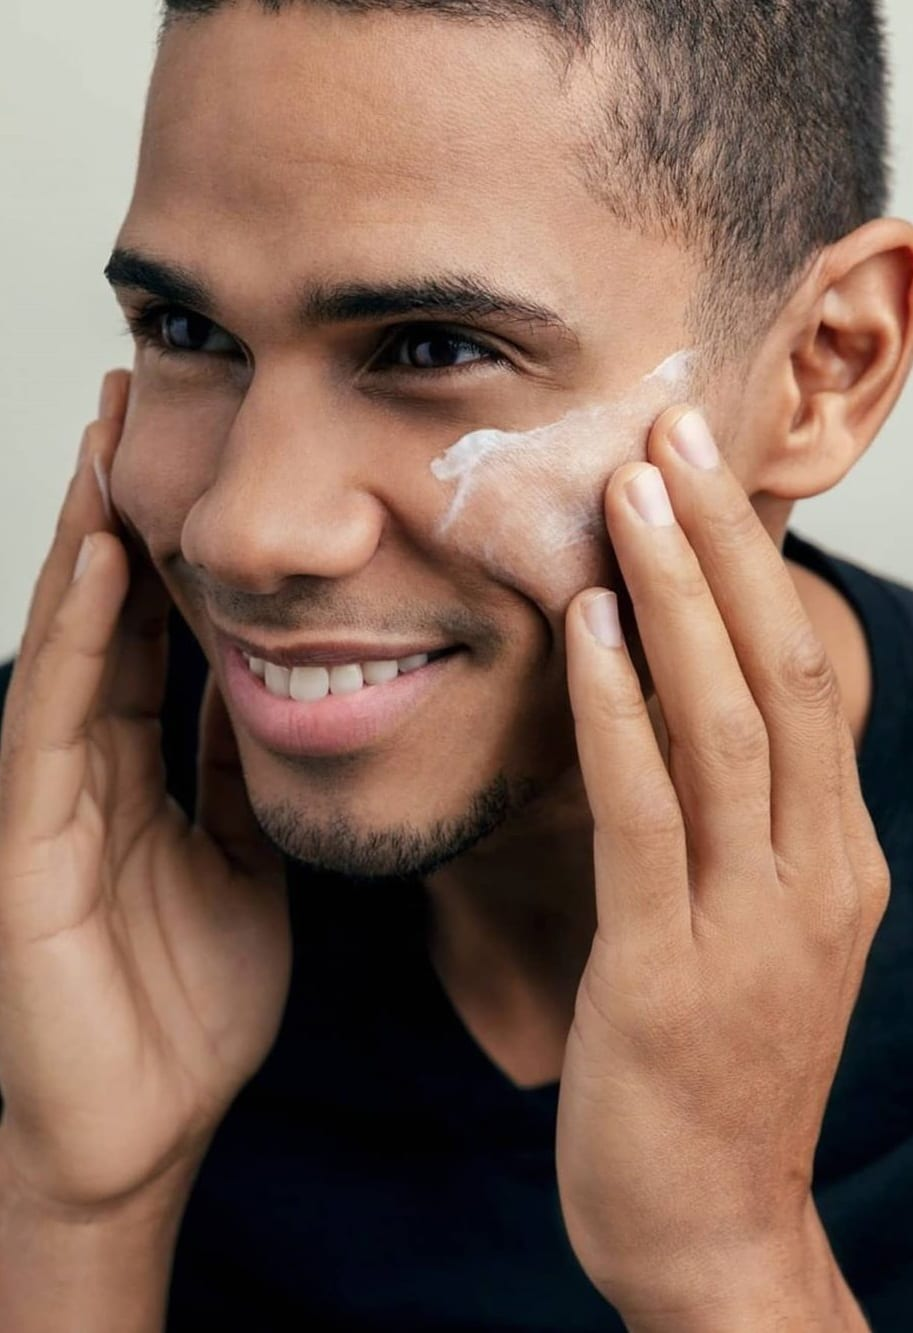 Skincare Routine for Men to Follow